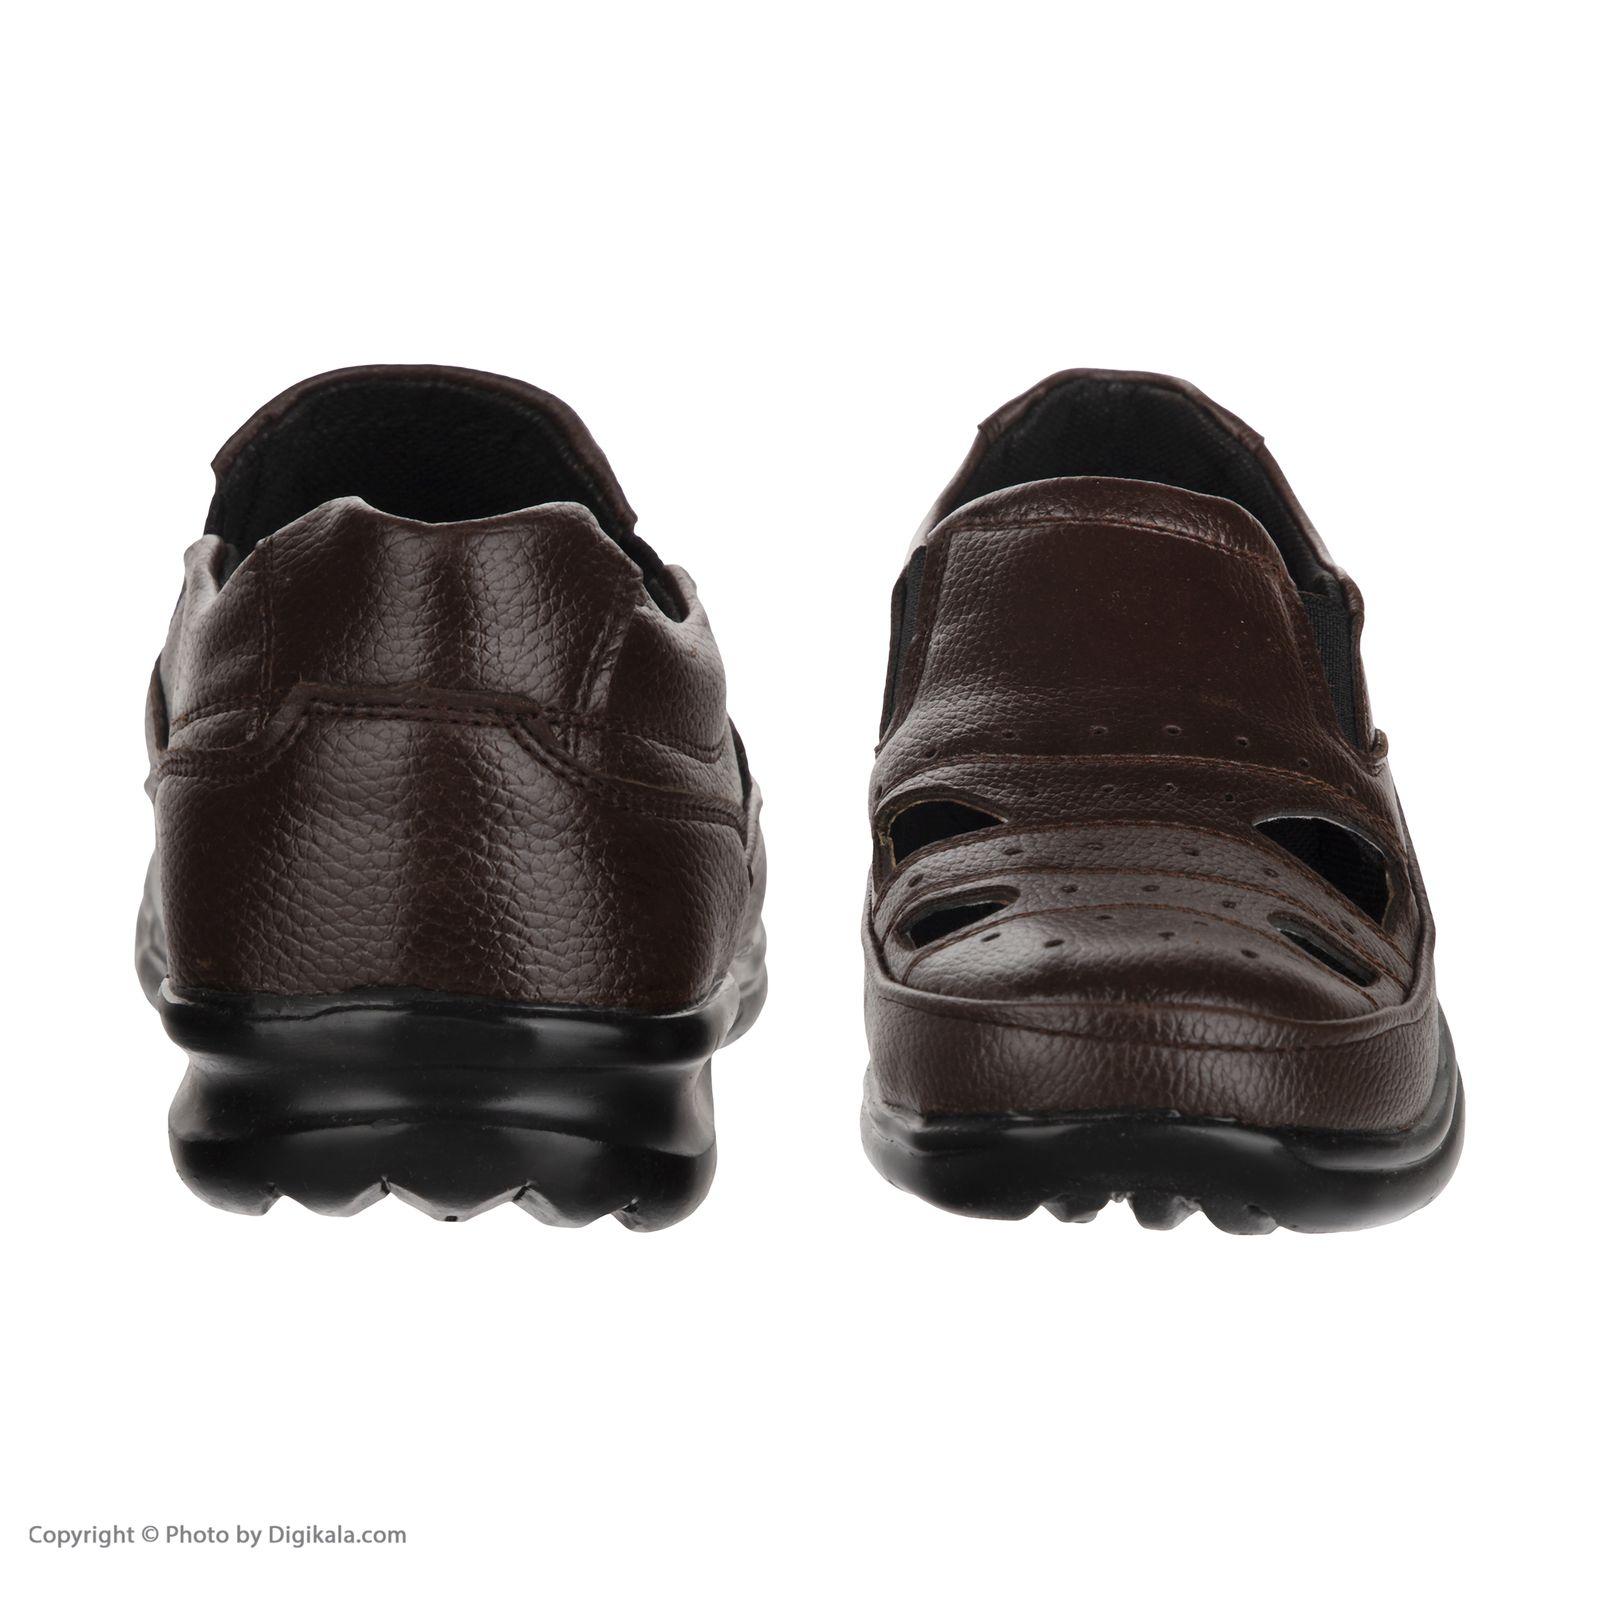 کفش روزمره مردانه مدل k.baz.076 -  - 4